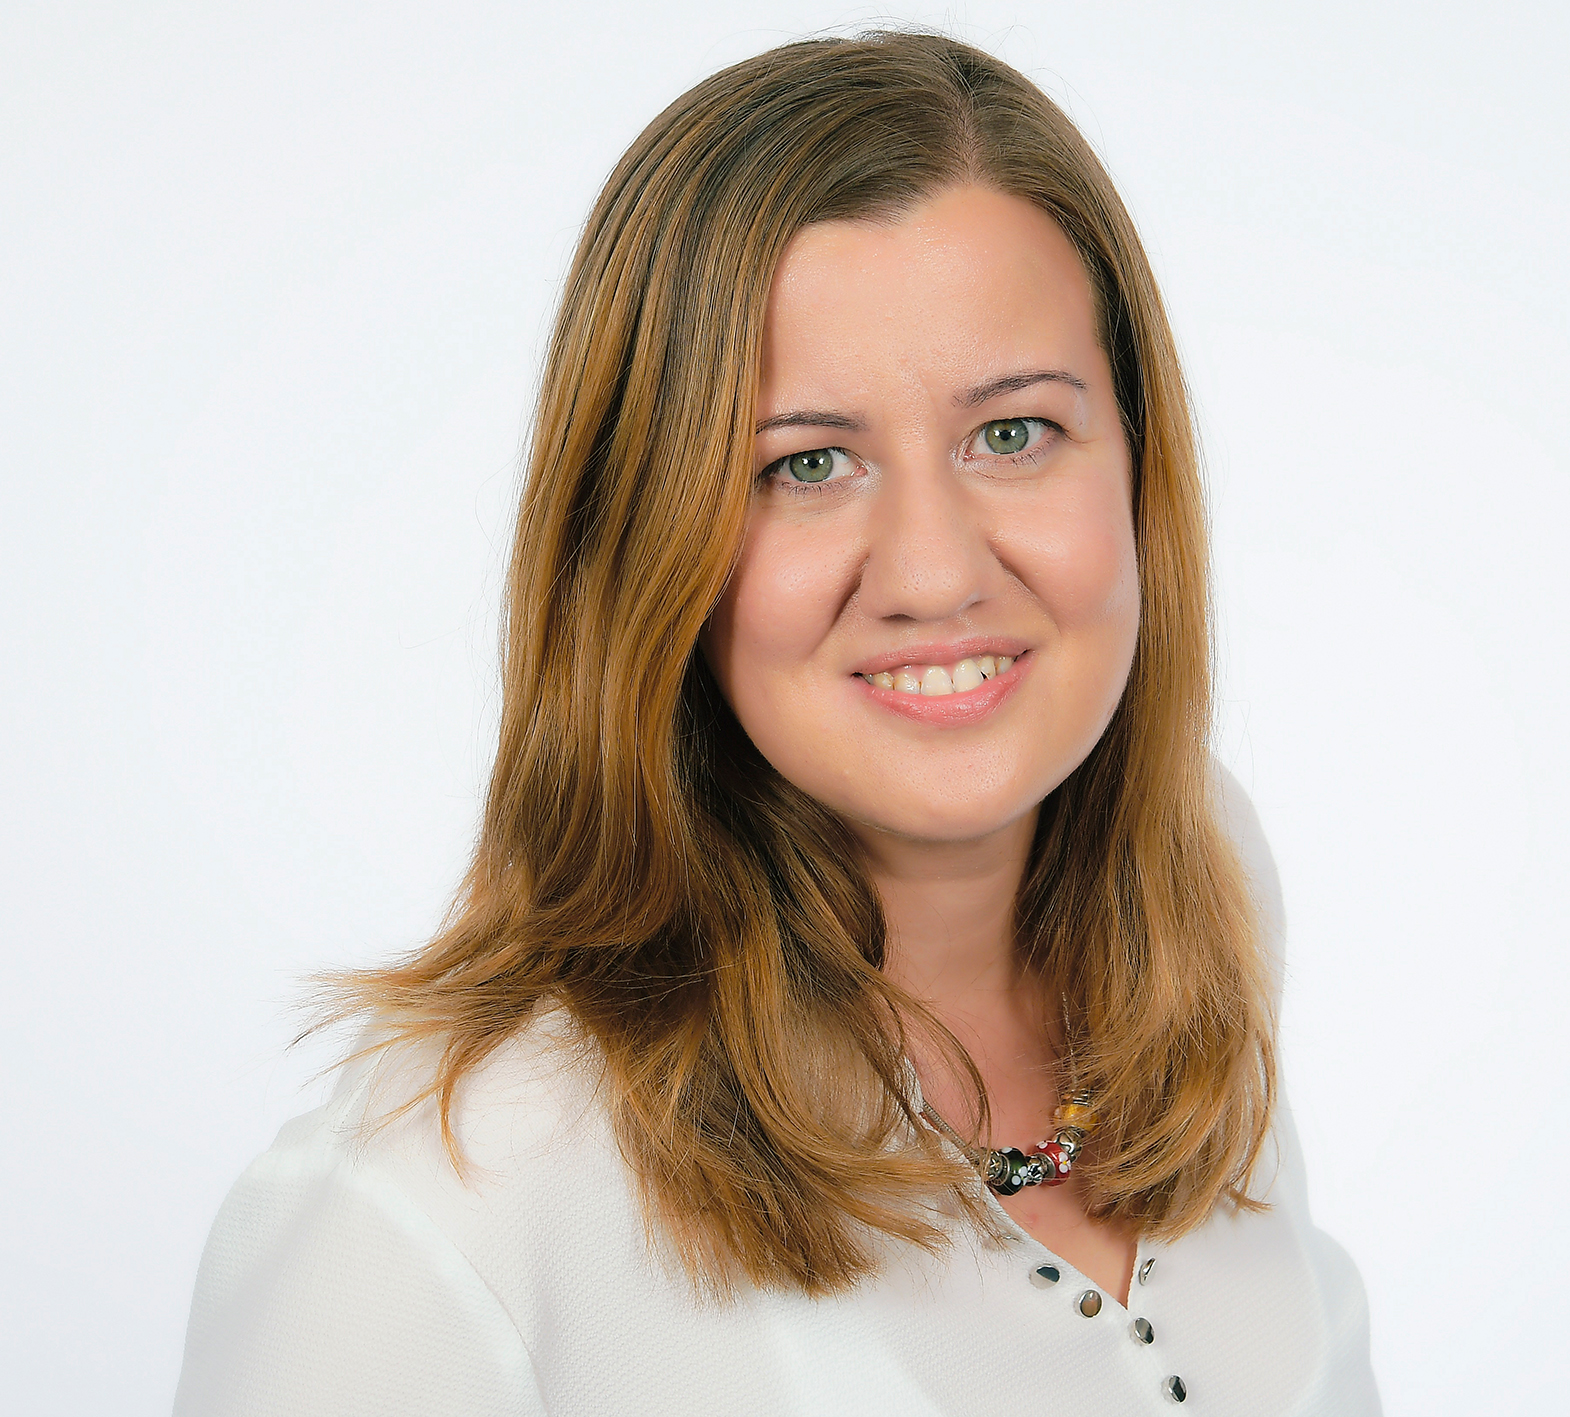 Stadtverordnete CDU-Fraktion Frankfurt Susanne Serke